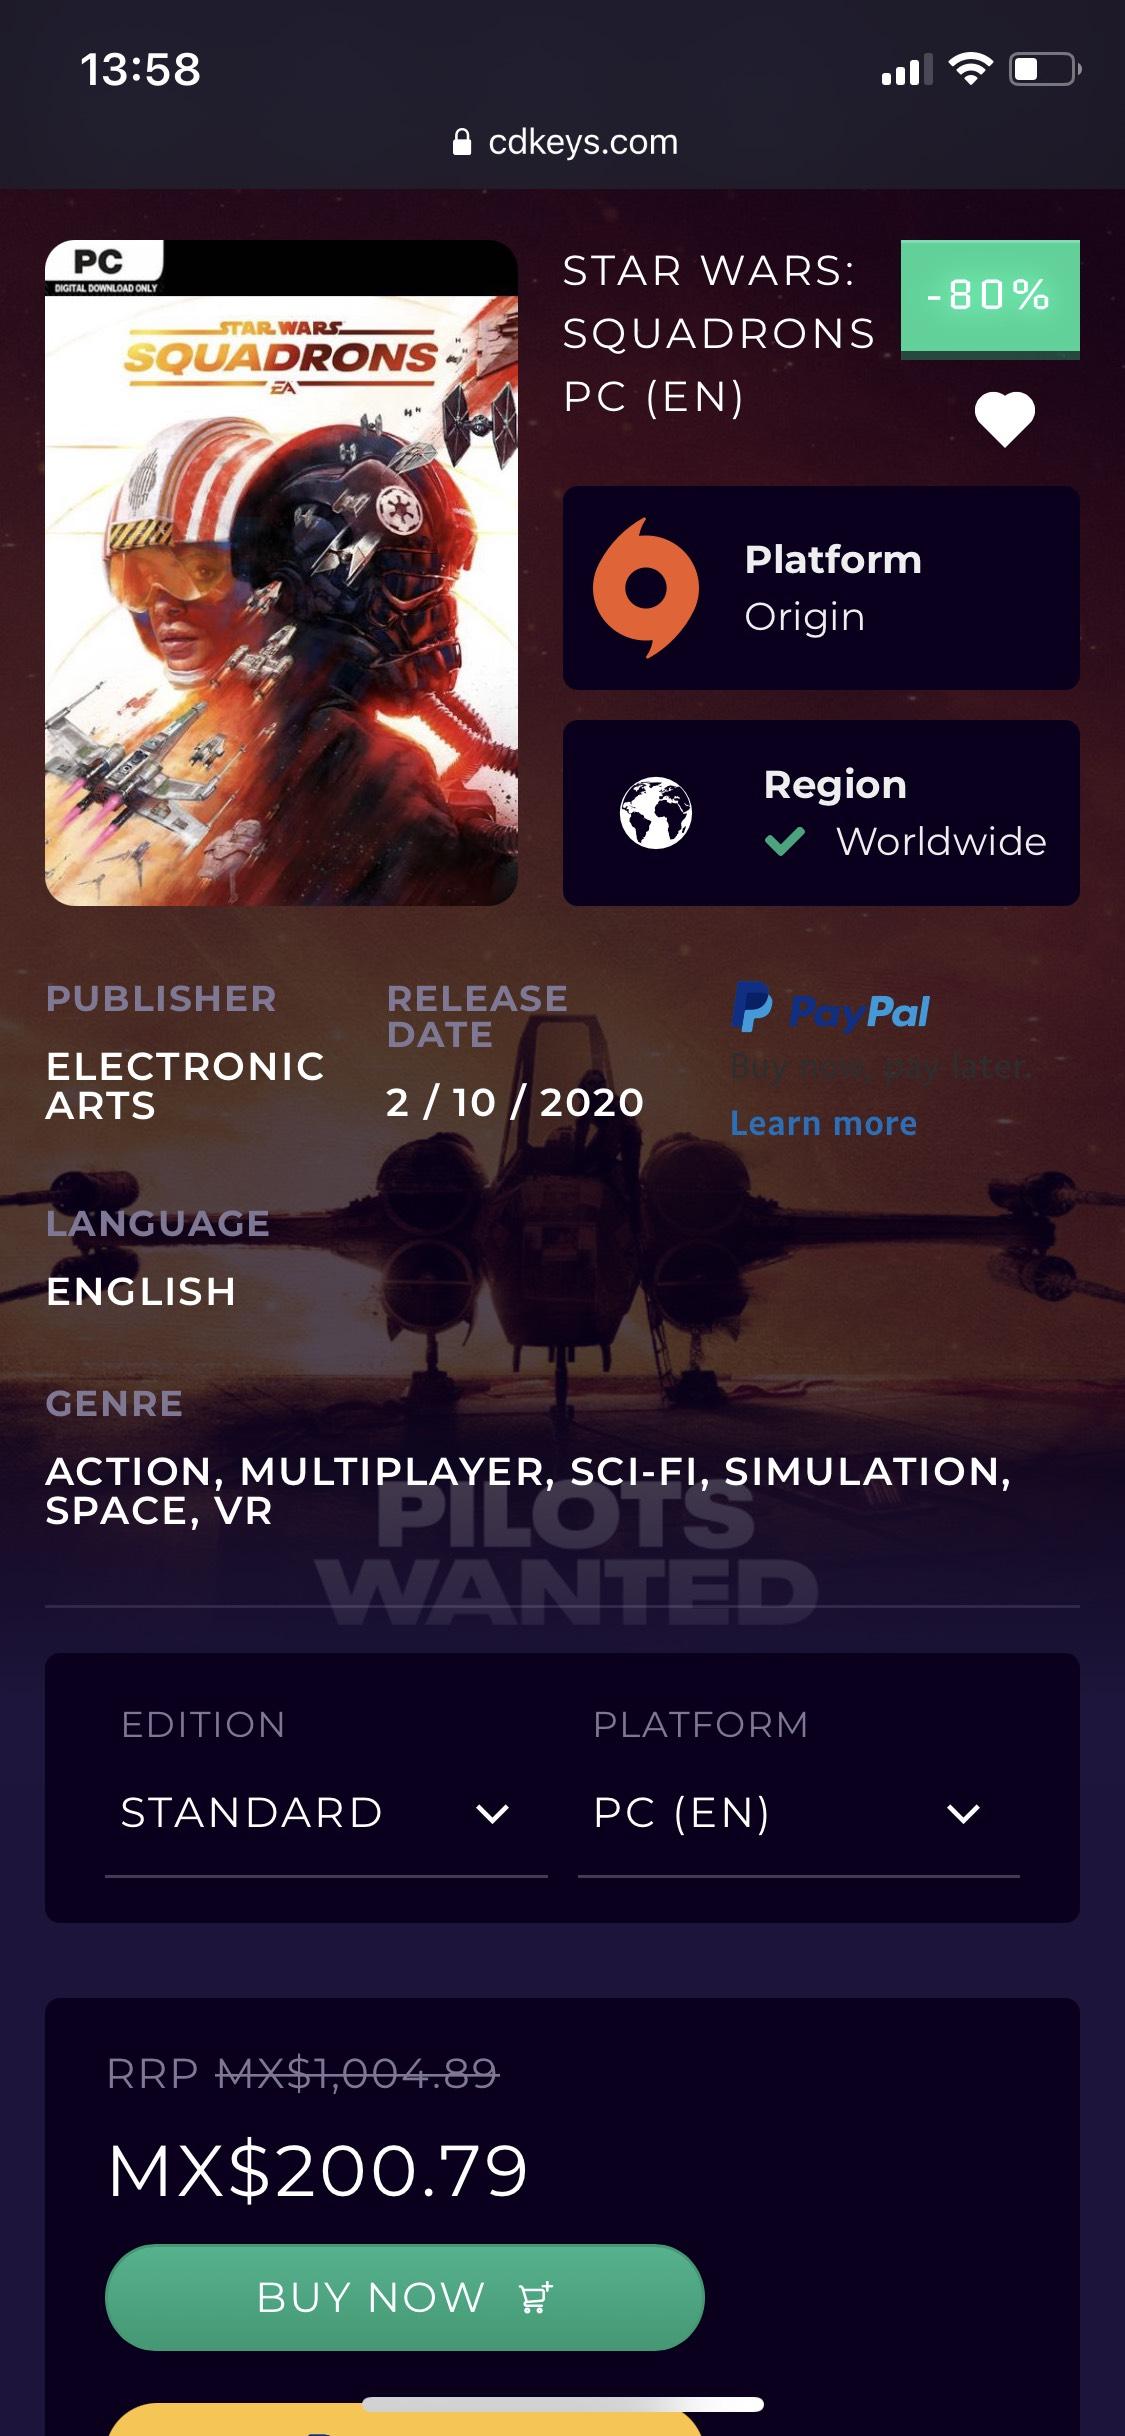 CDkeys, Star Wars: Squadrons -80%